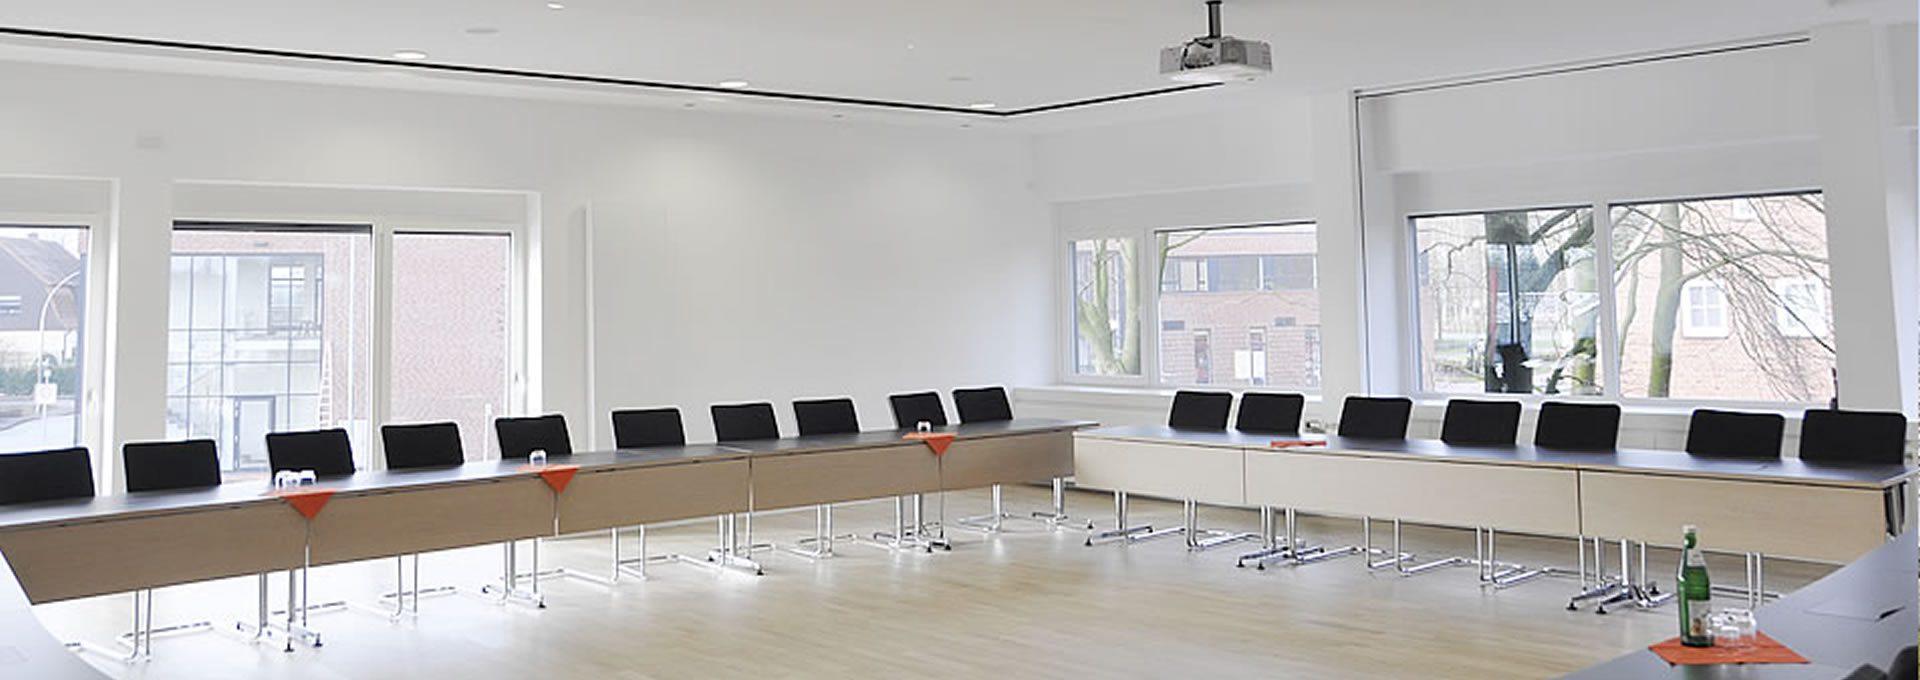 Wieling GmbH – Ochtrup – Innenausbau   Parkettböden   Akustikdecken